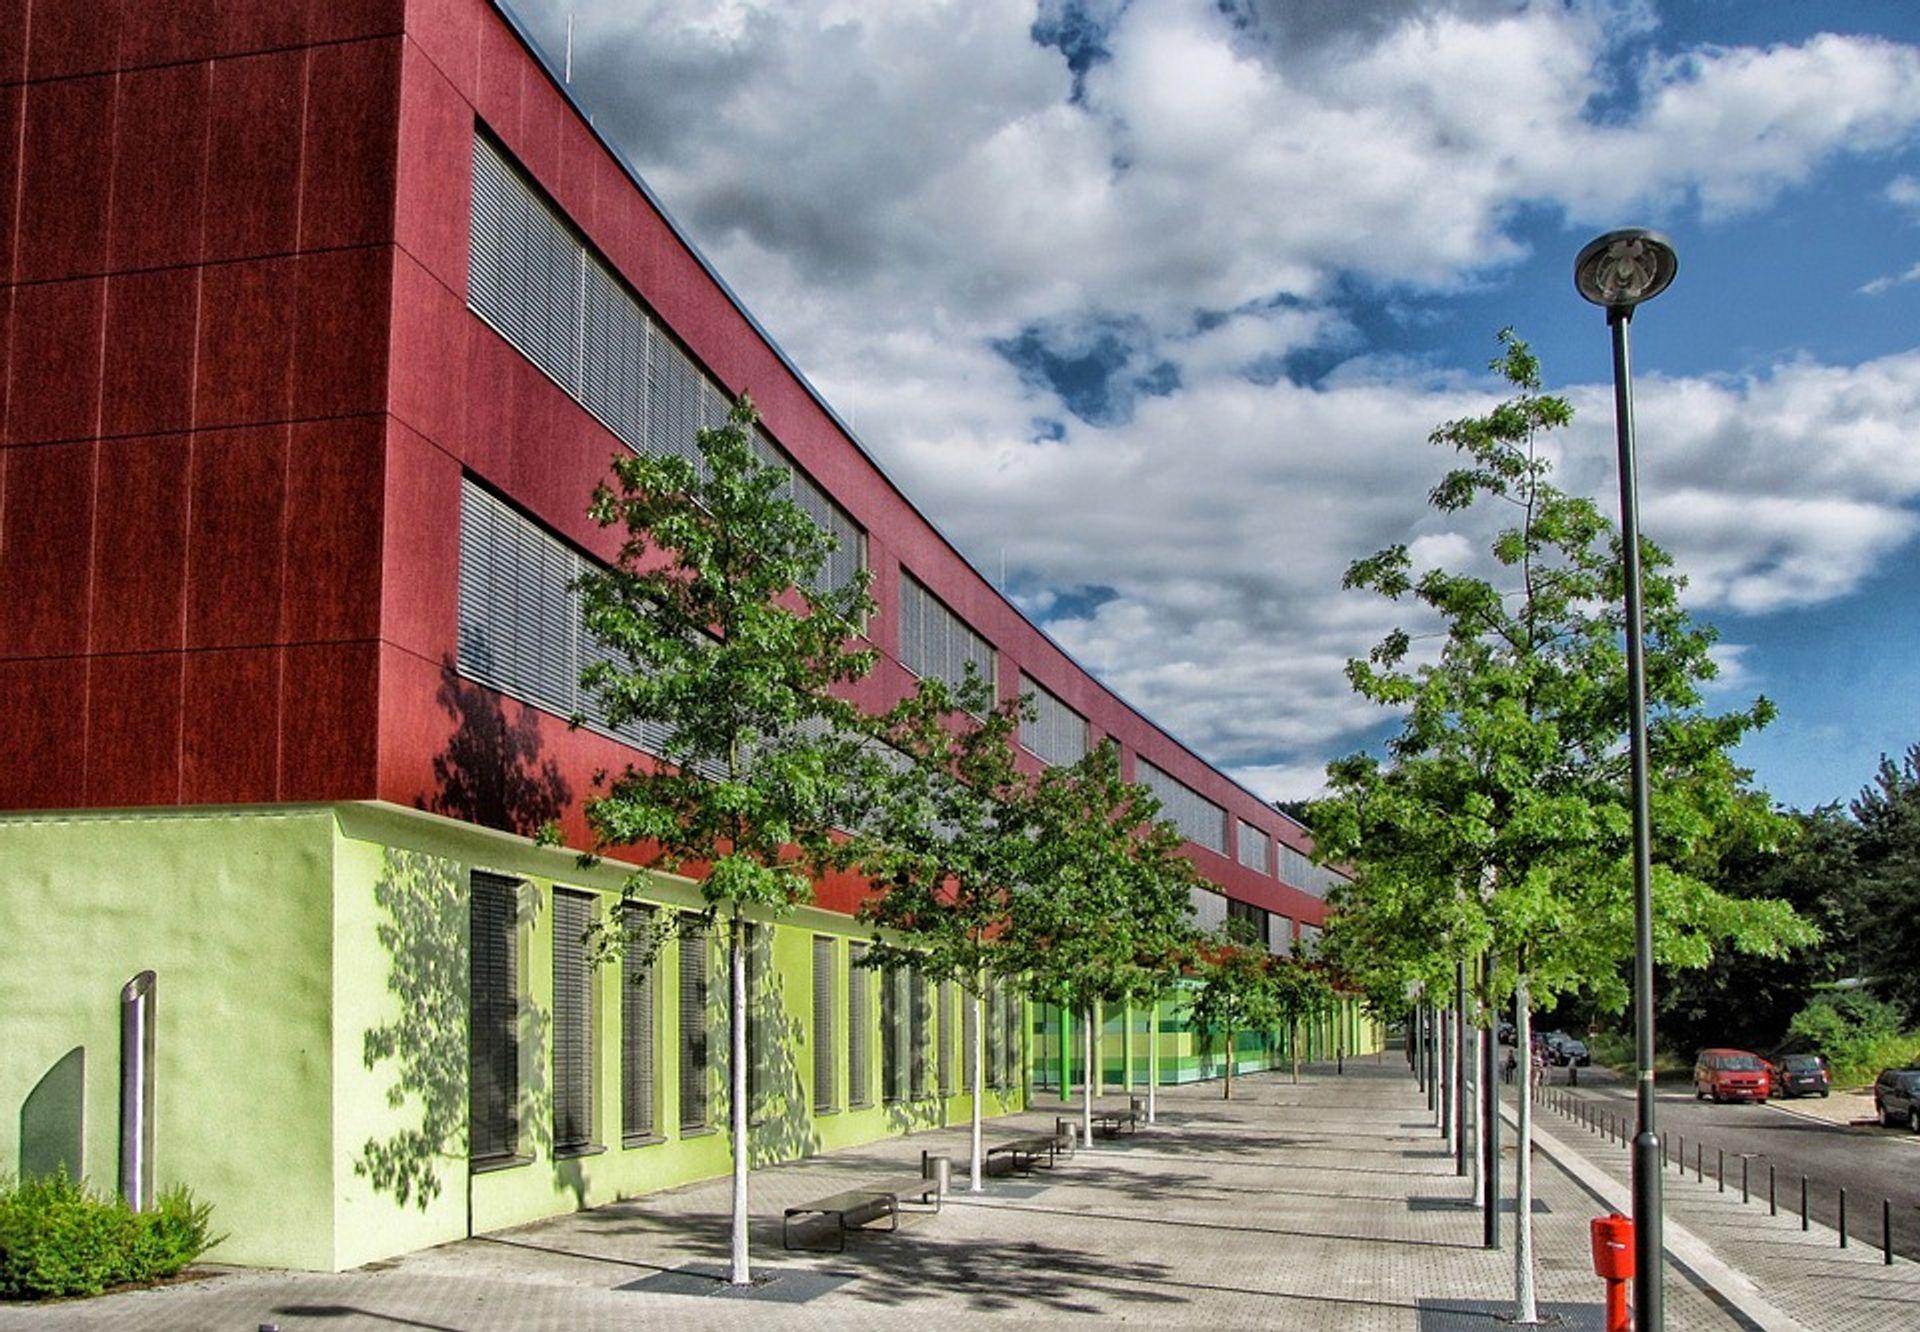 Anticimex Kammerjäger in Darmstadt